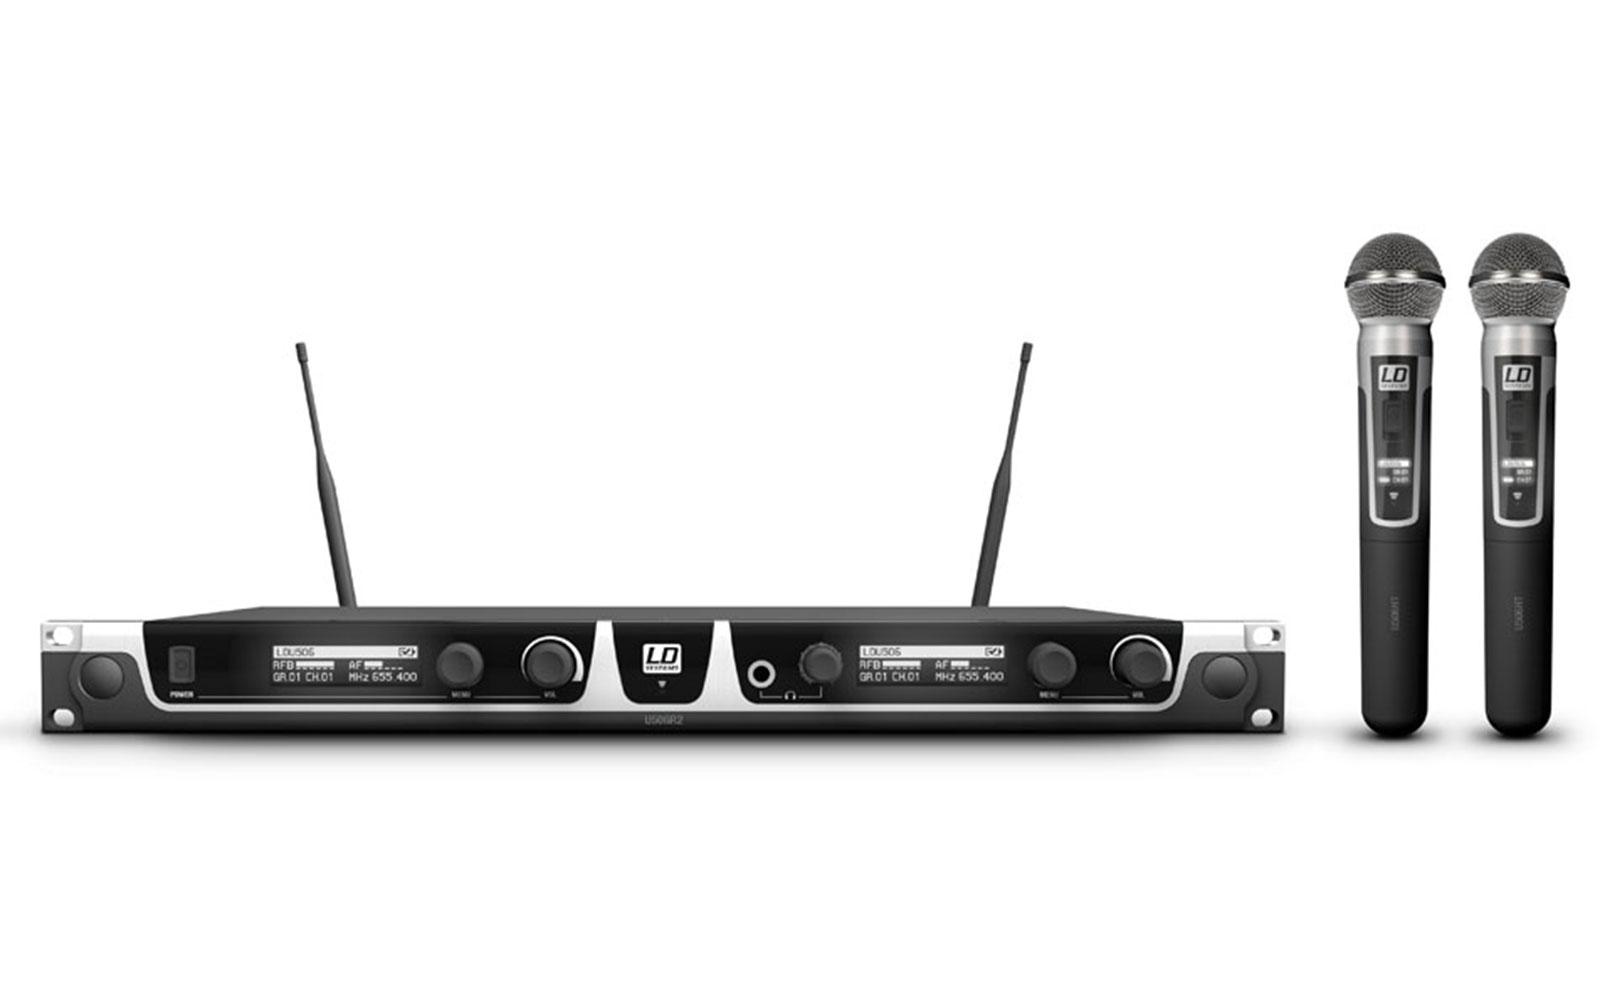 ld-systems-u506-hhd-2-funkmikrofon-system-mit-2-x-handmikrofon-dynamisch